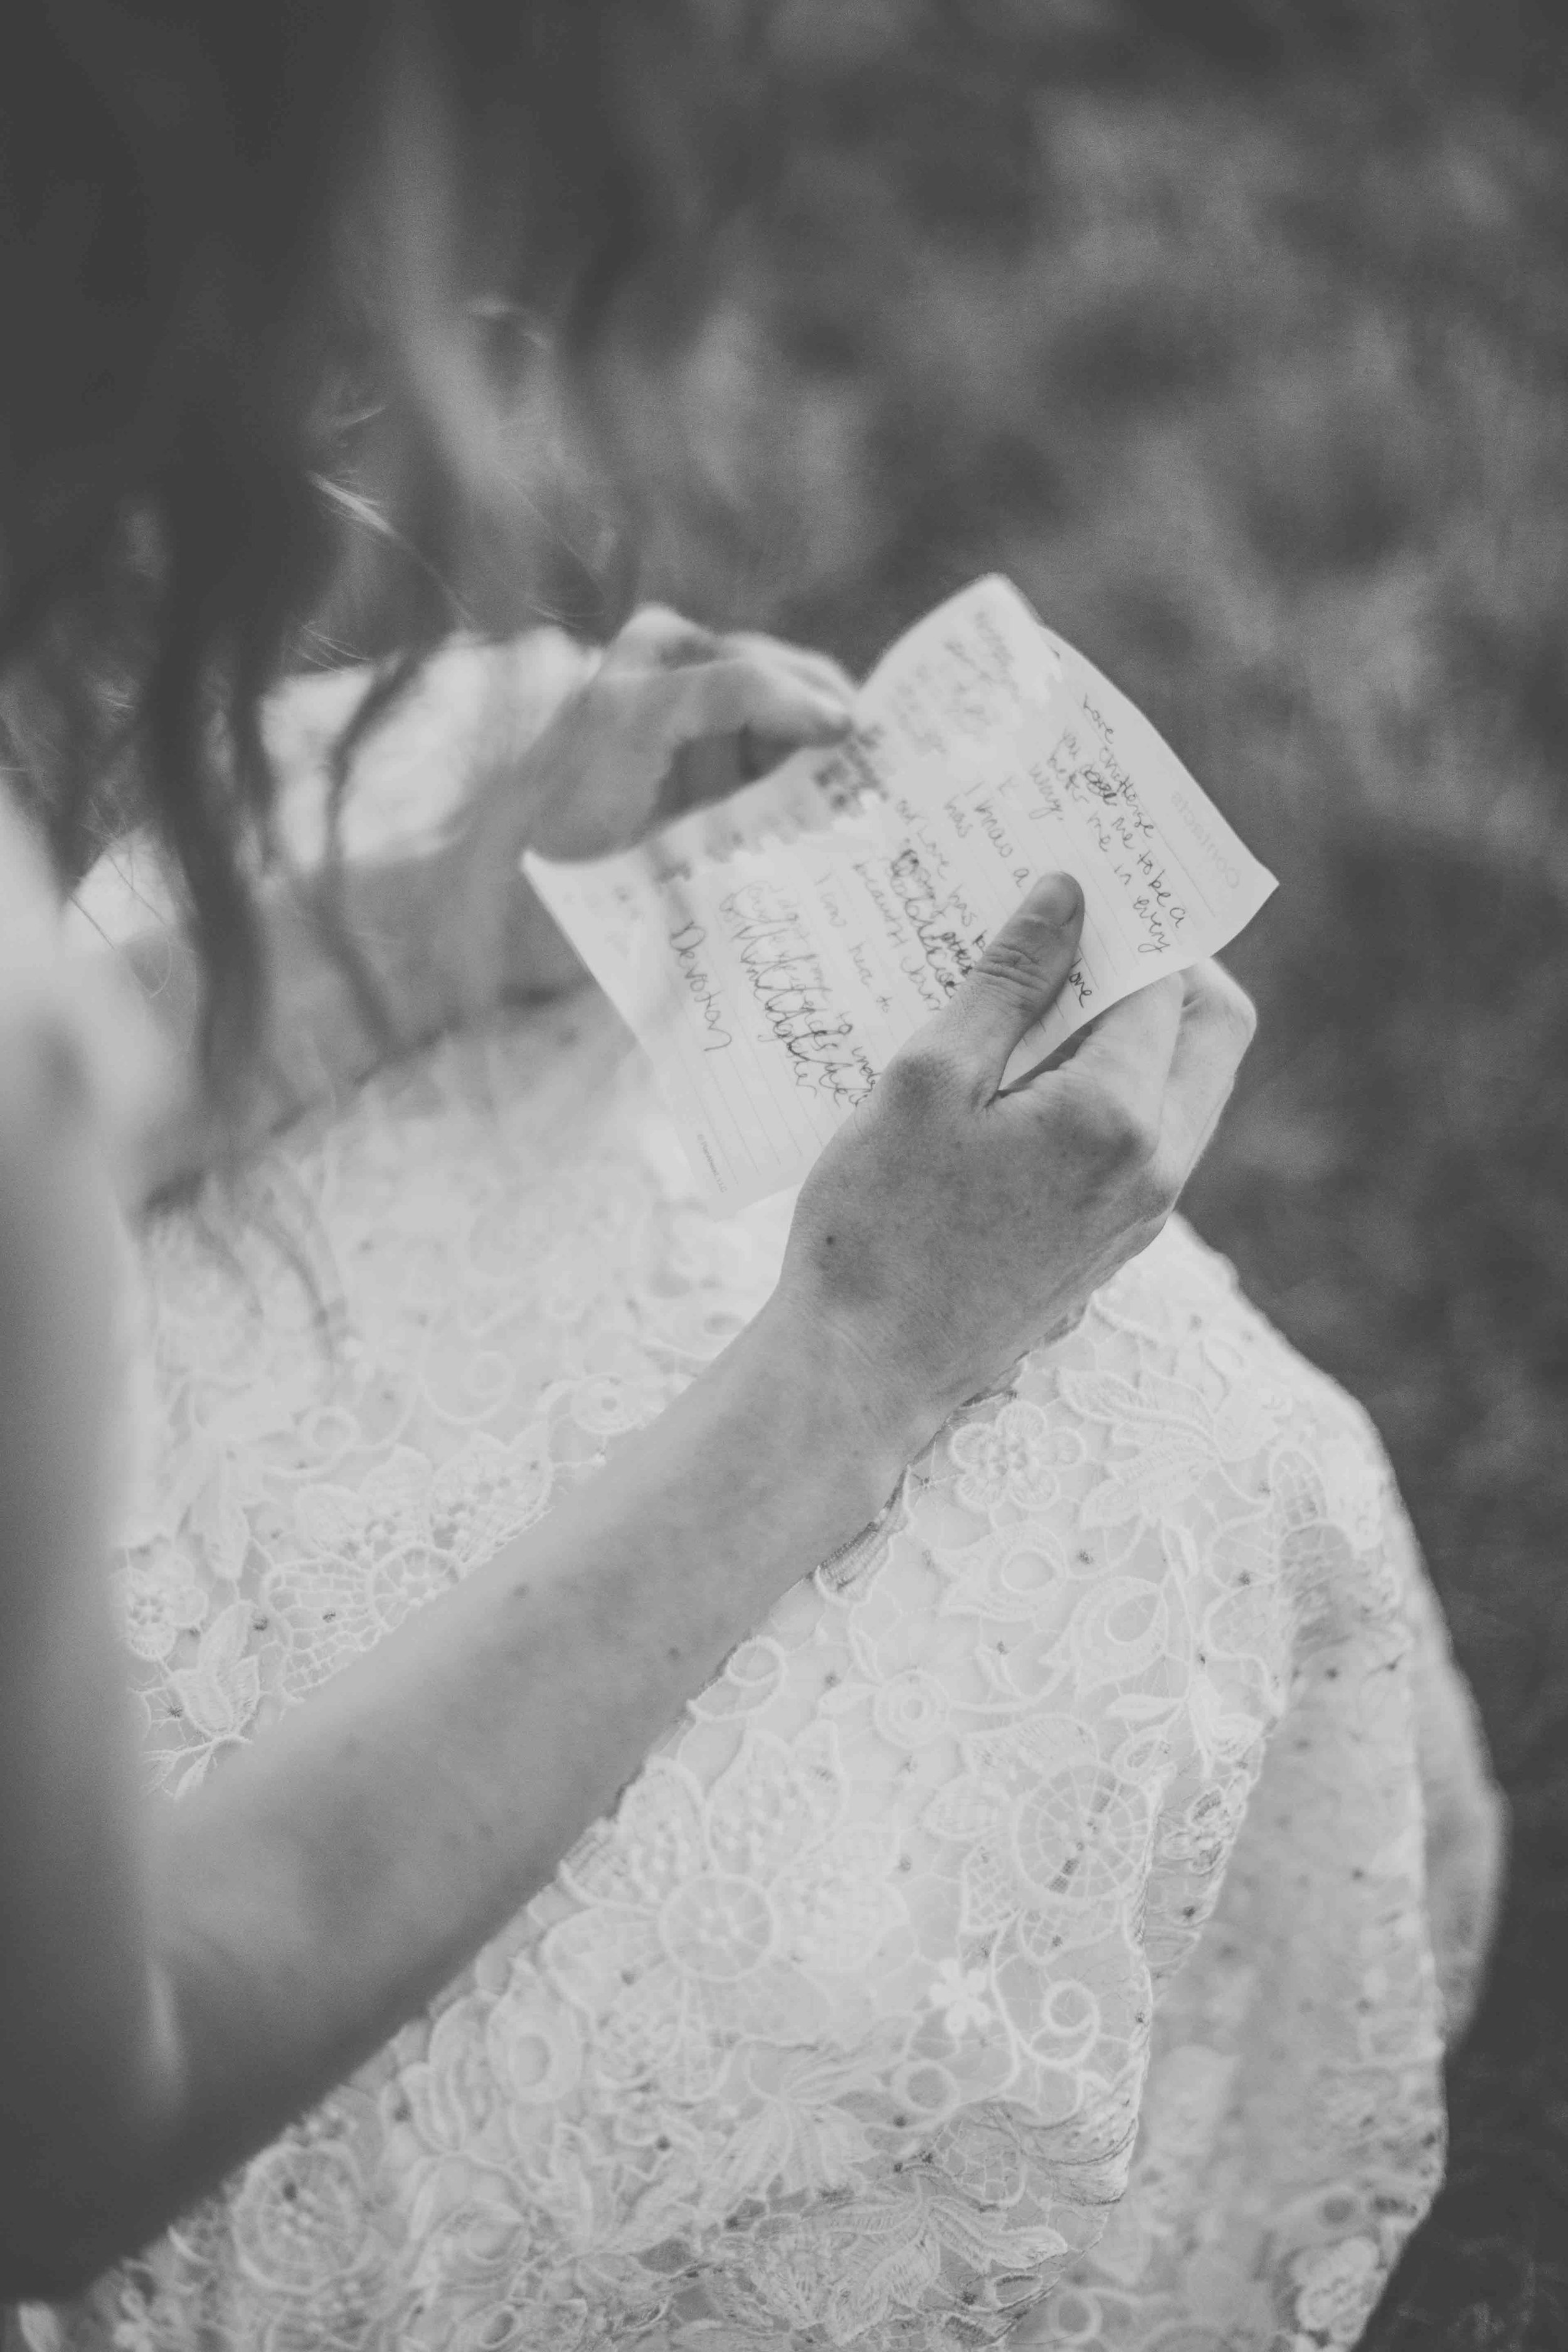 north-carolina-elopement-photographer-7.jpg